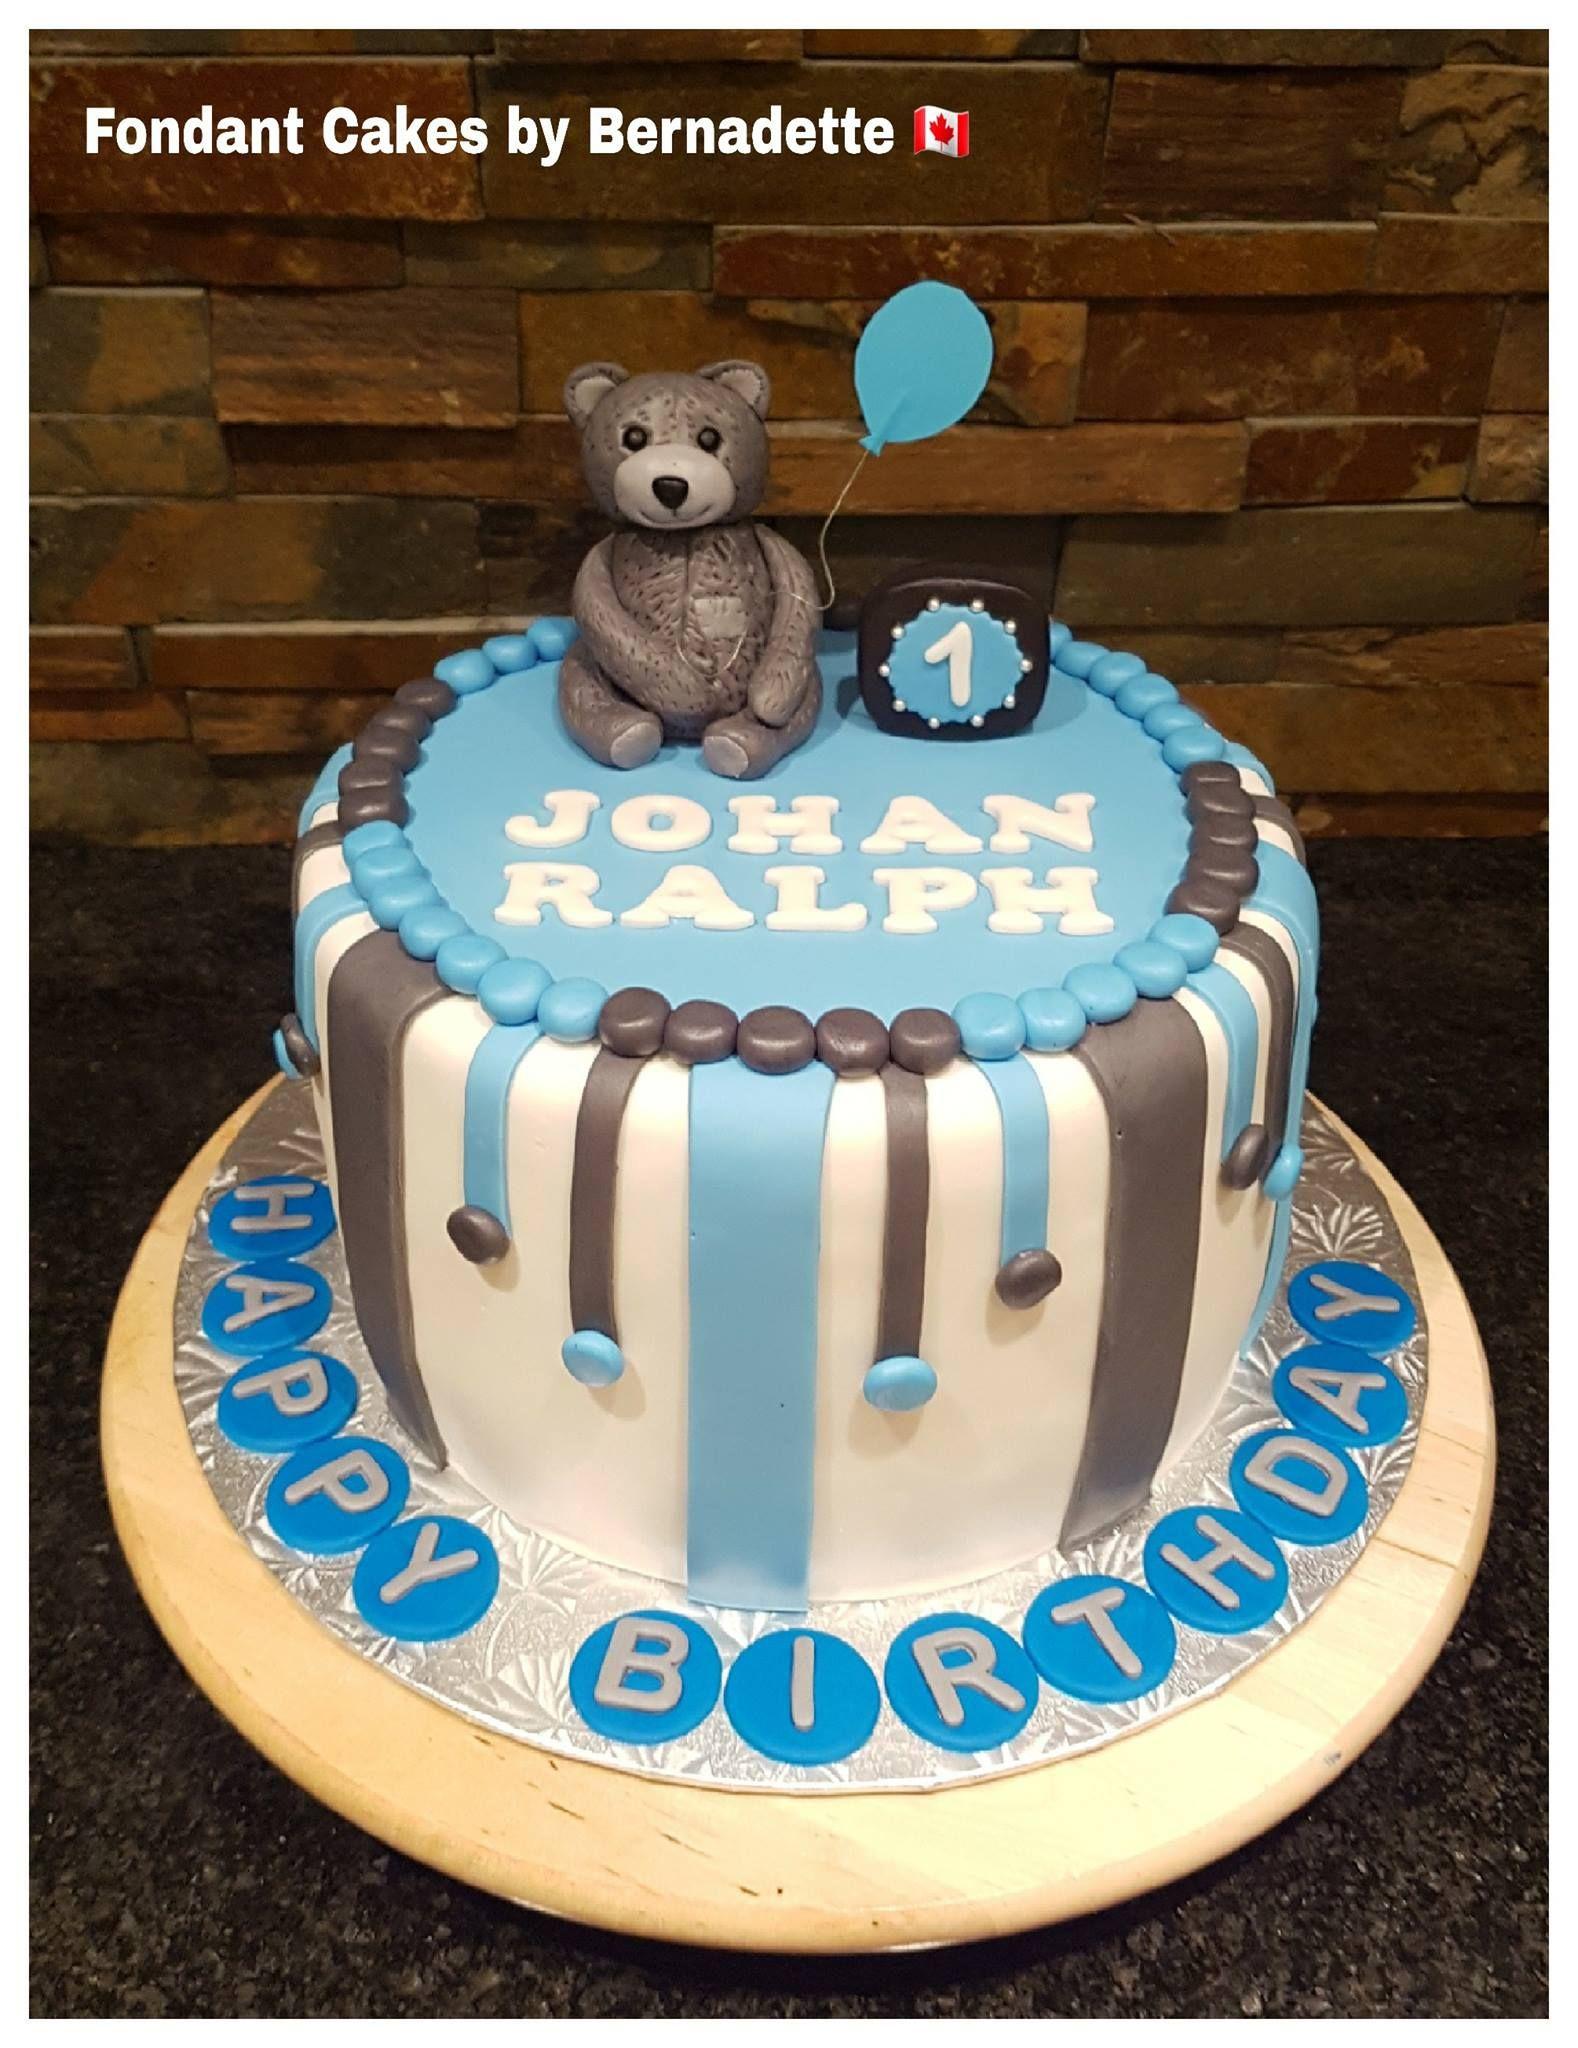 Johan Ralphs Birthday Cake My Creations Pinterest Birthday